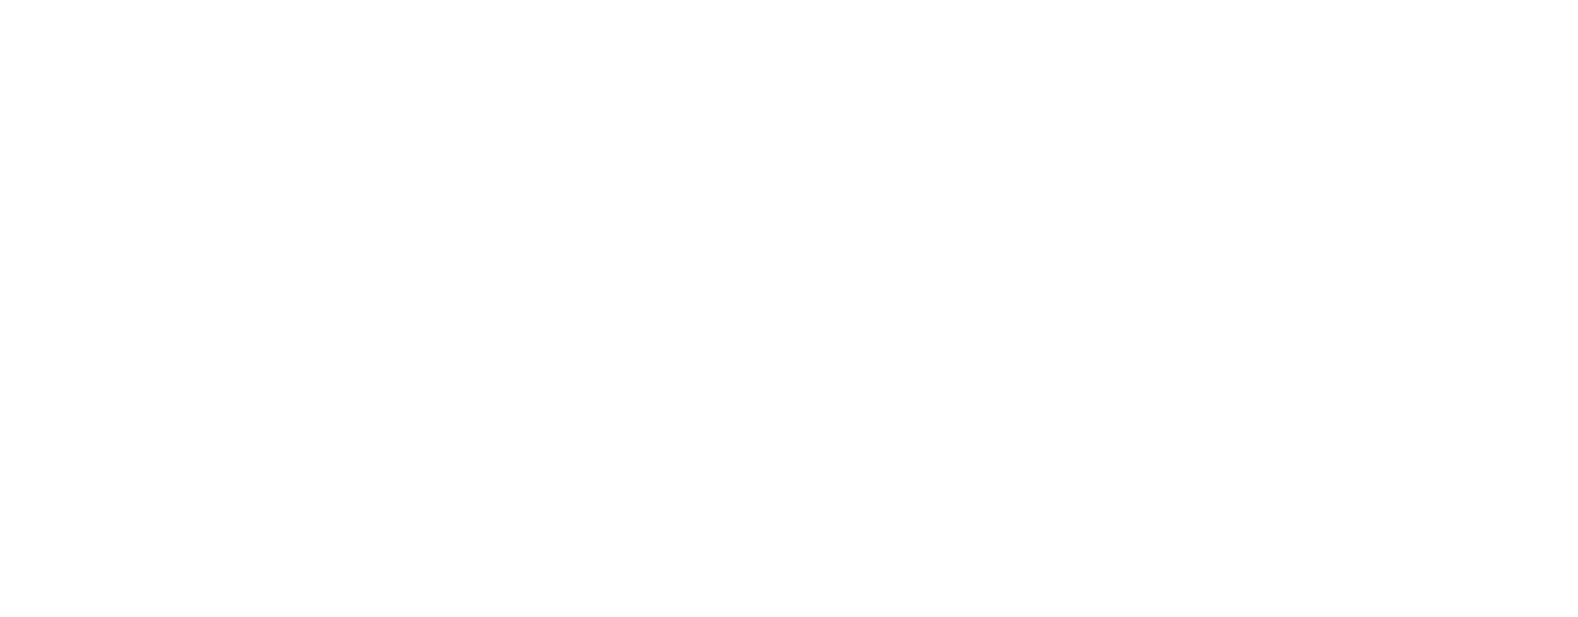 Urban-x-logo